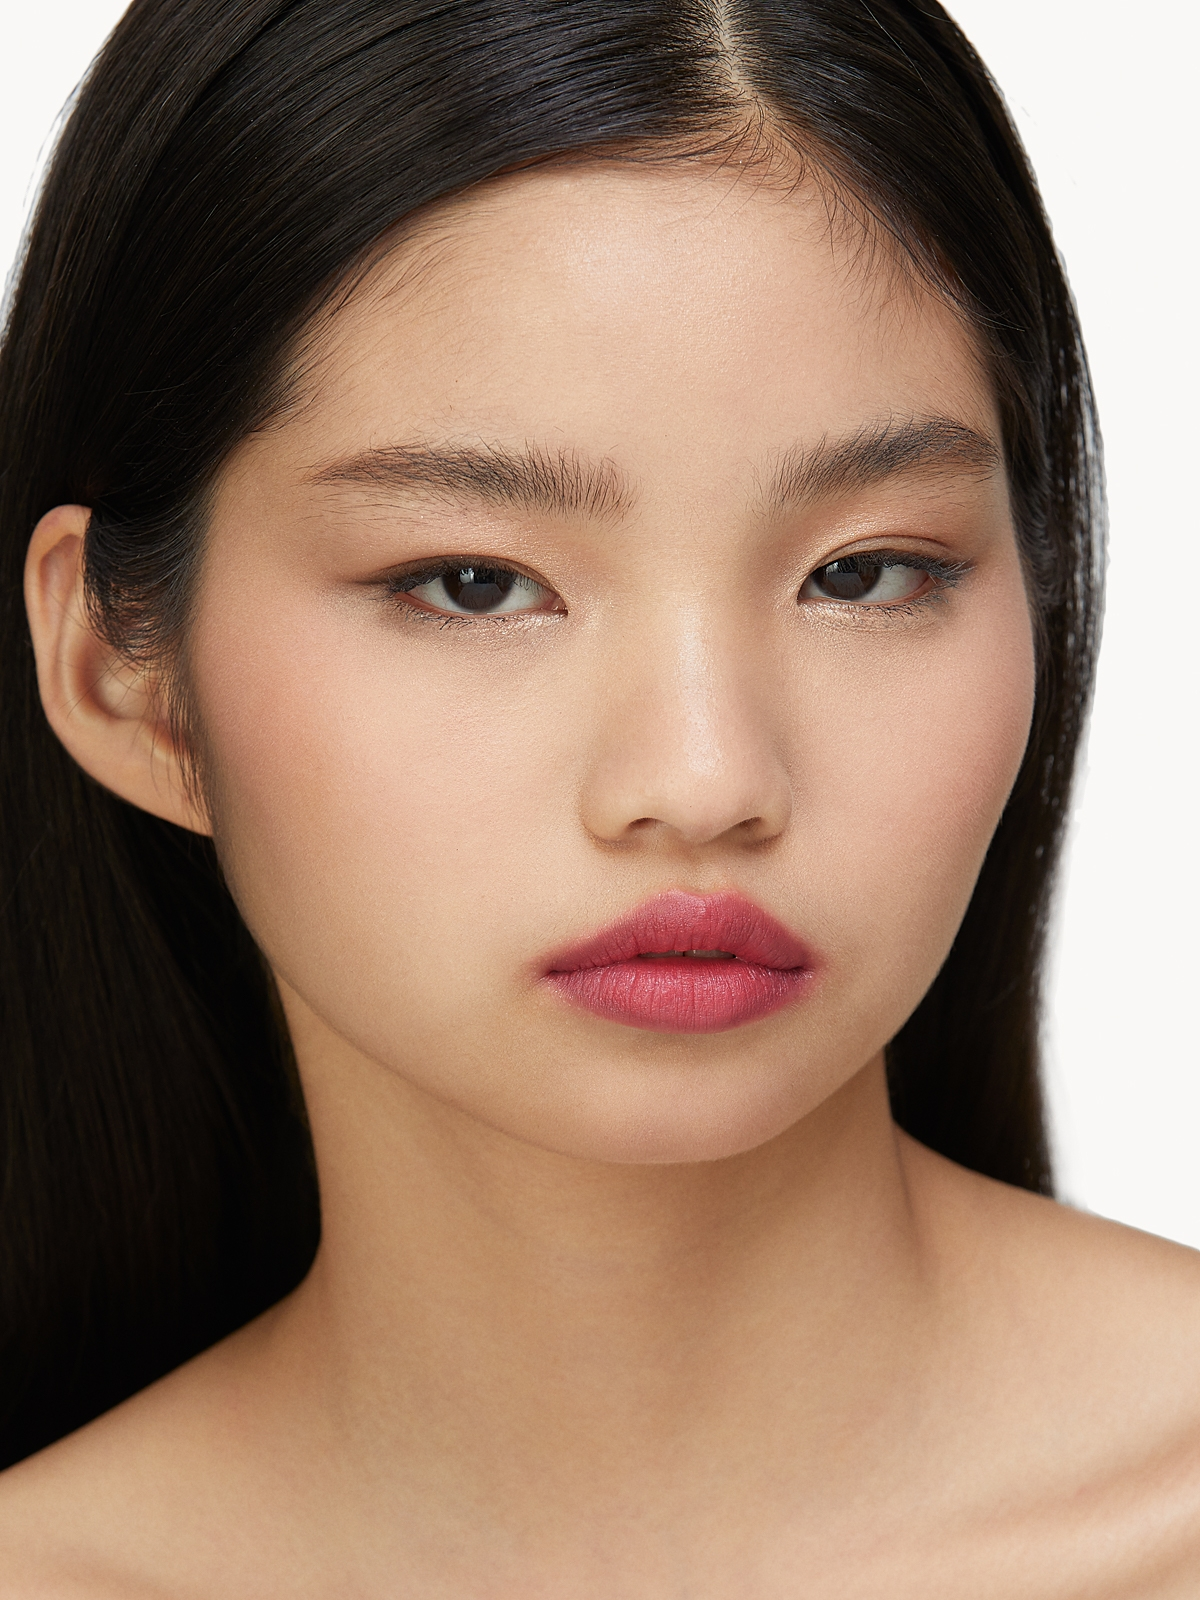 B by BANILA Lipdraw Matte Blast Lipstick WoWoman